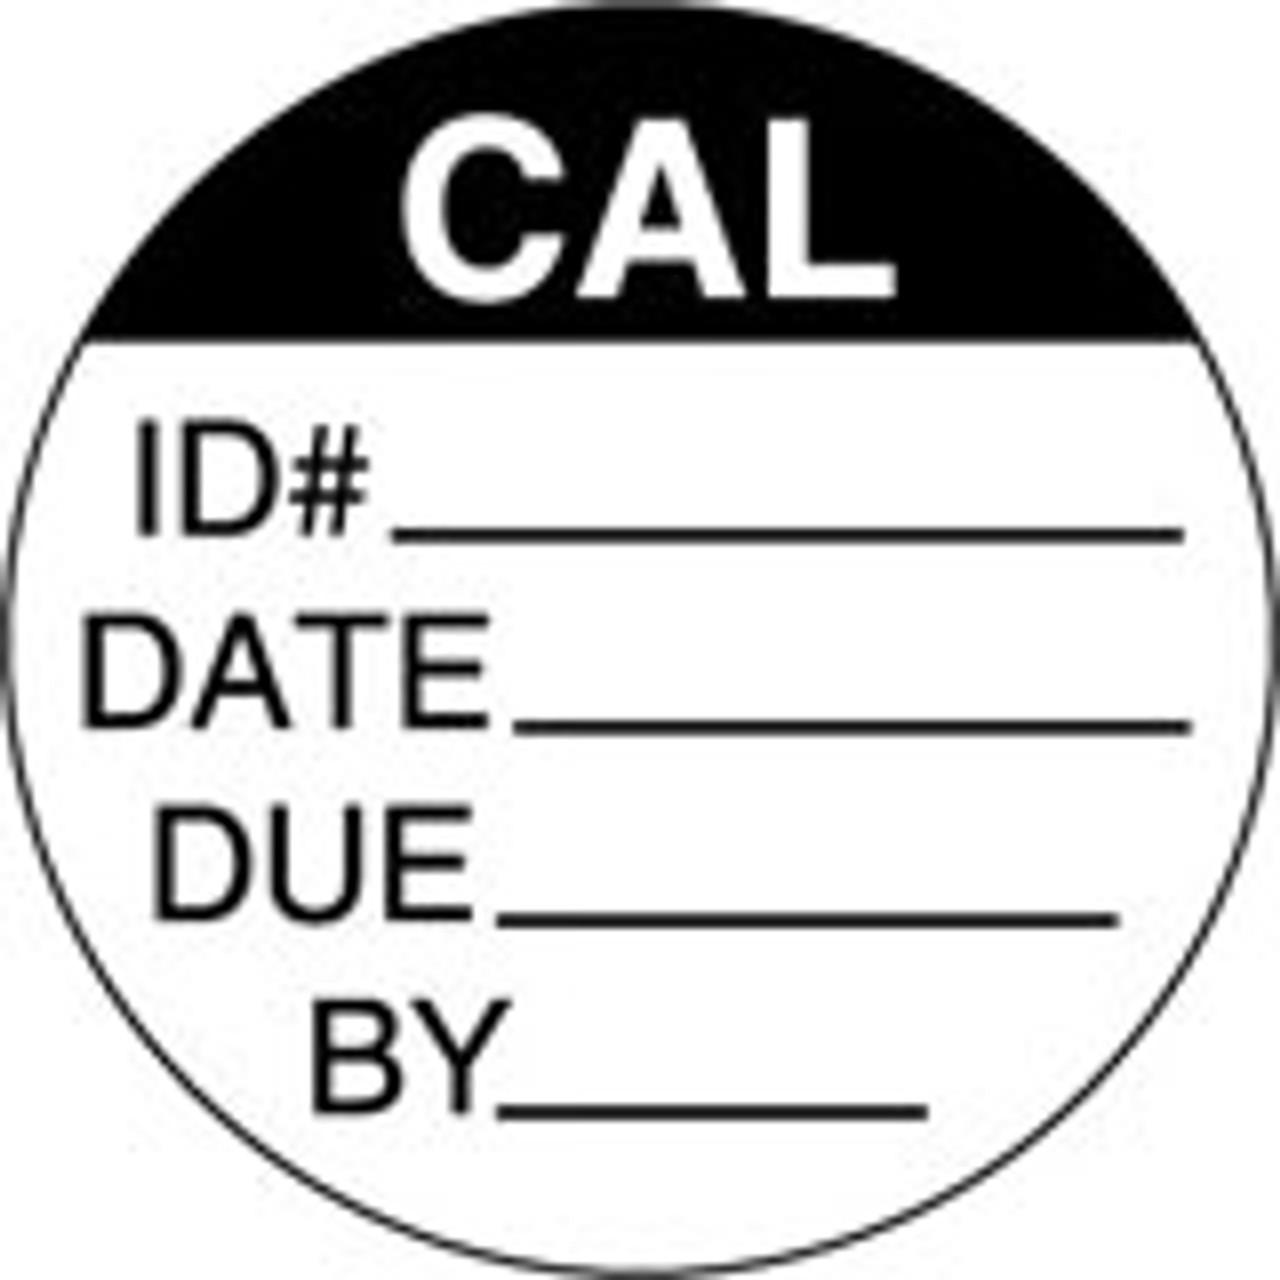 Calibration Labels image